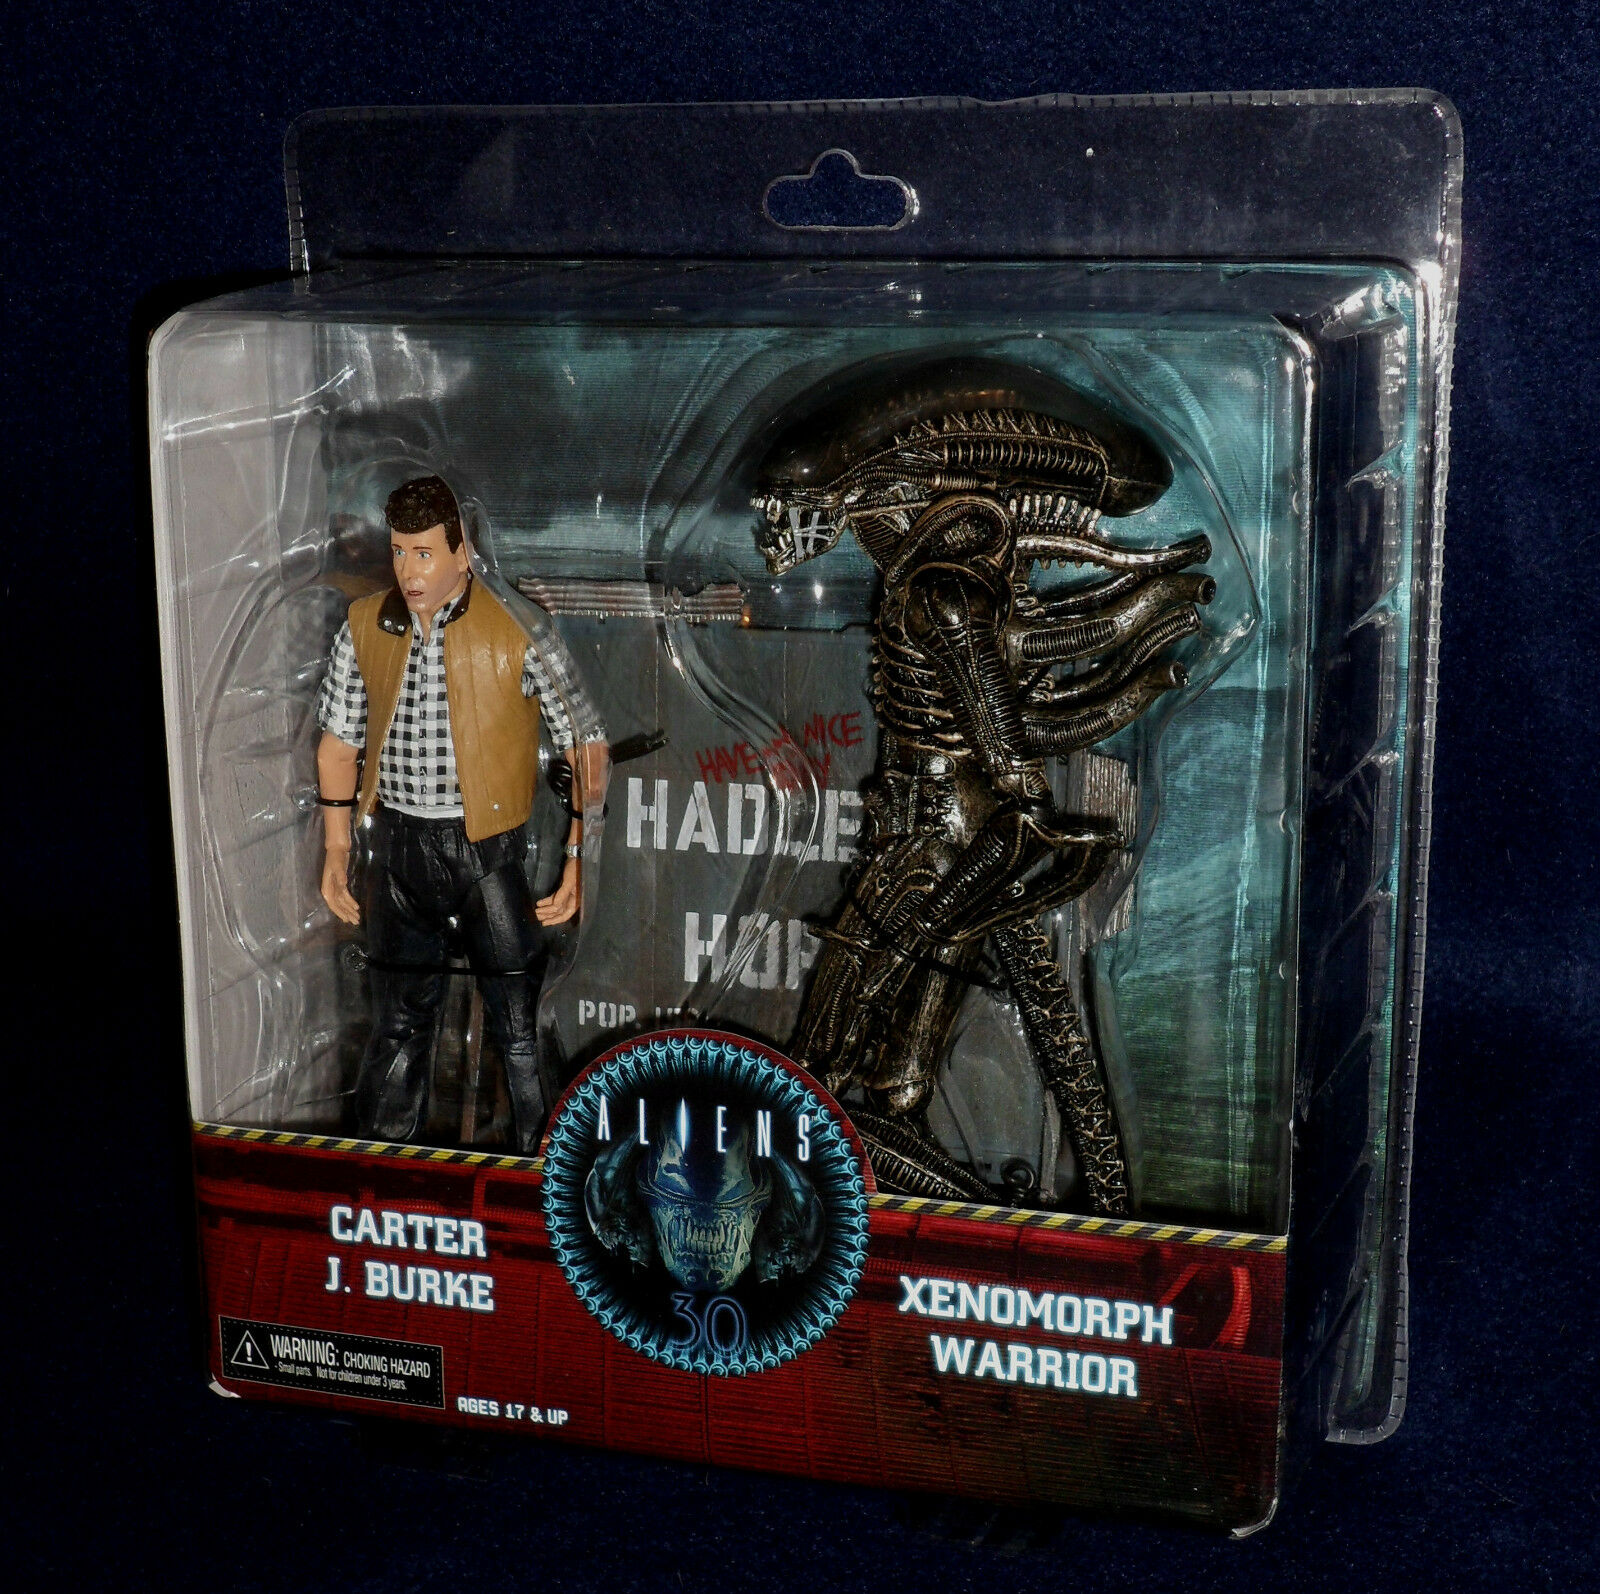 Aliens HADLEY'S HOPE - CARTER BURKE & XENOMORPH WARRIOR 7  Scale Figure Set NECA